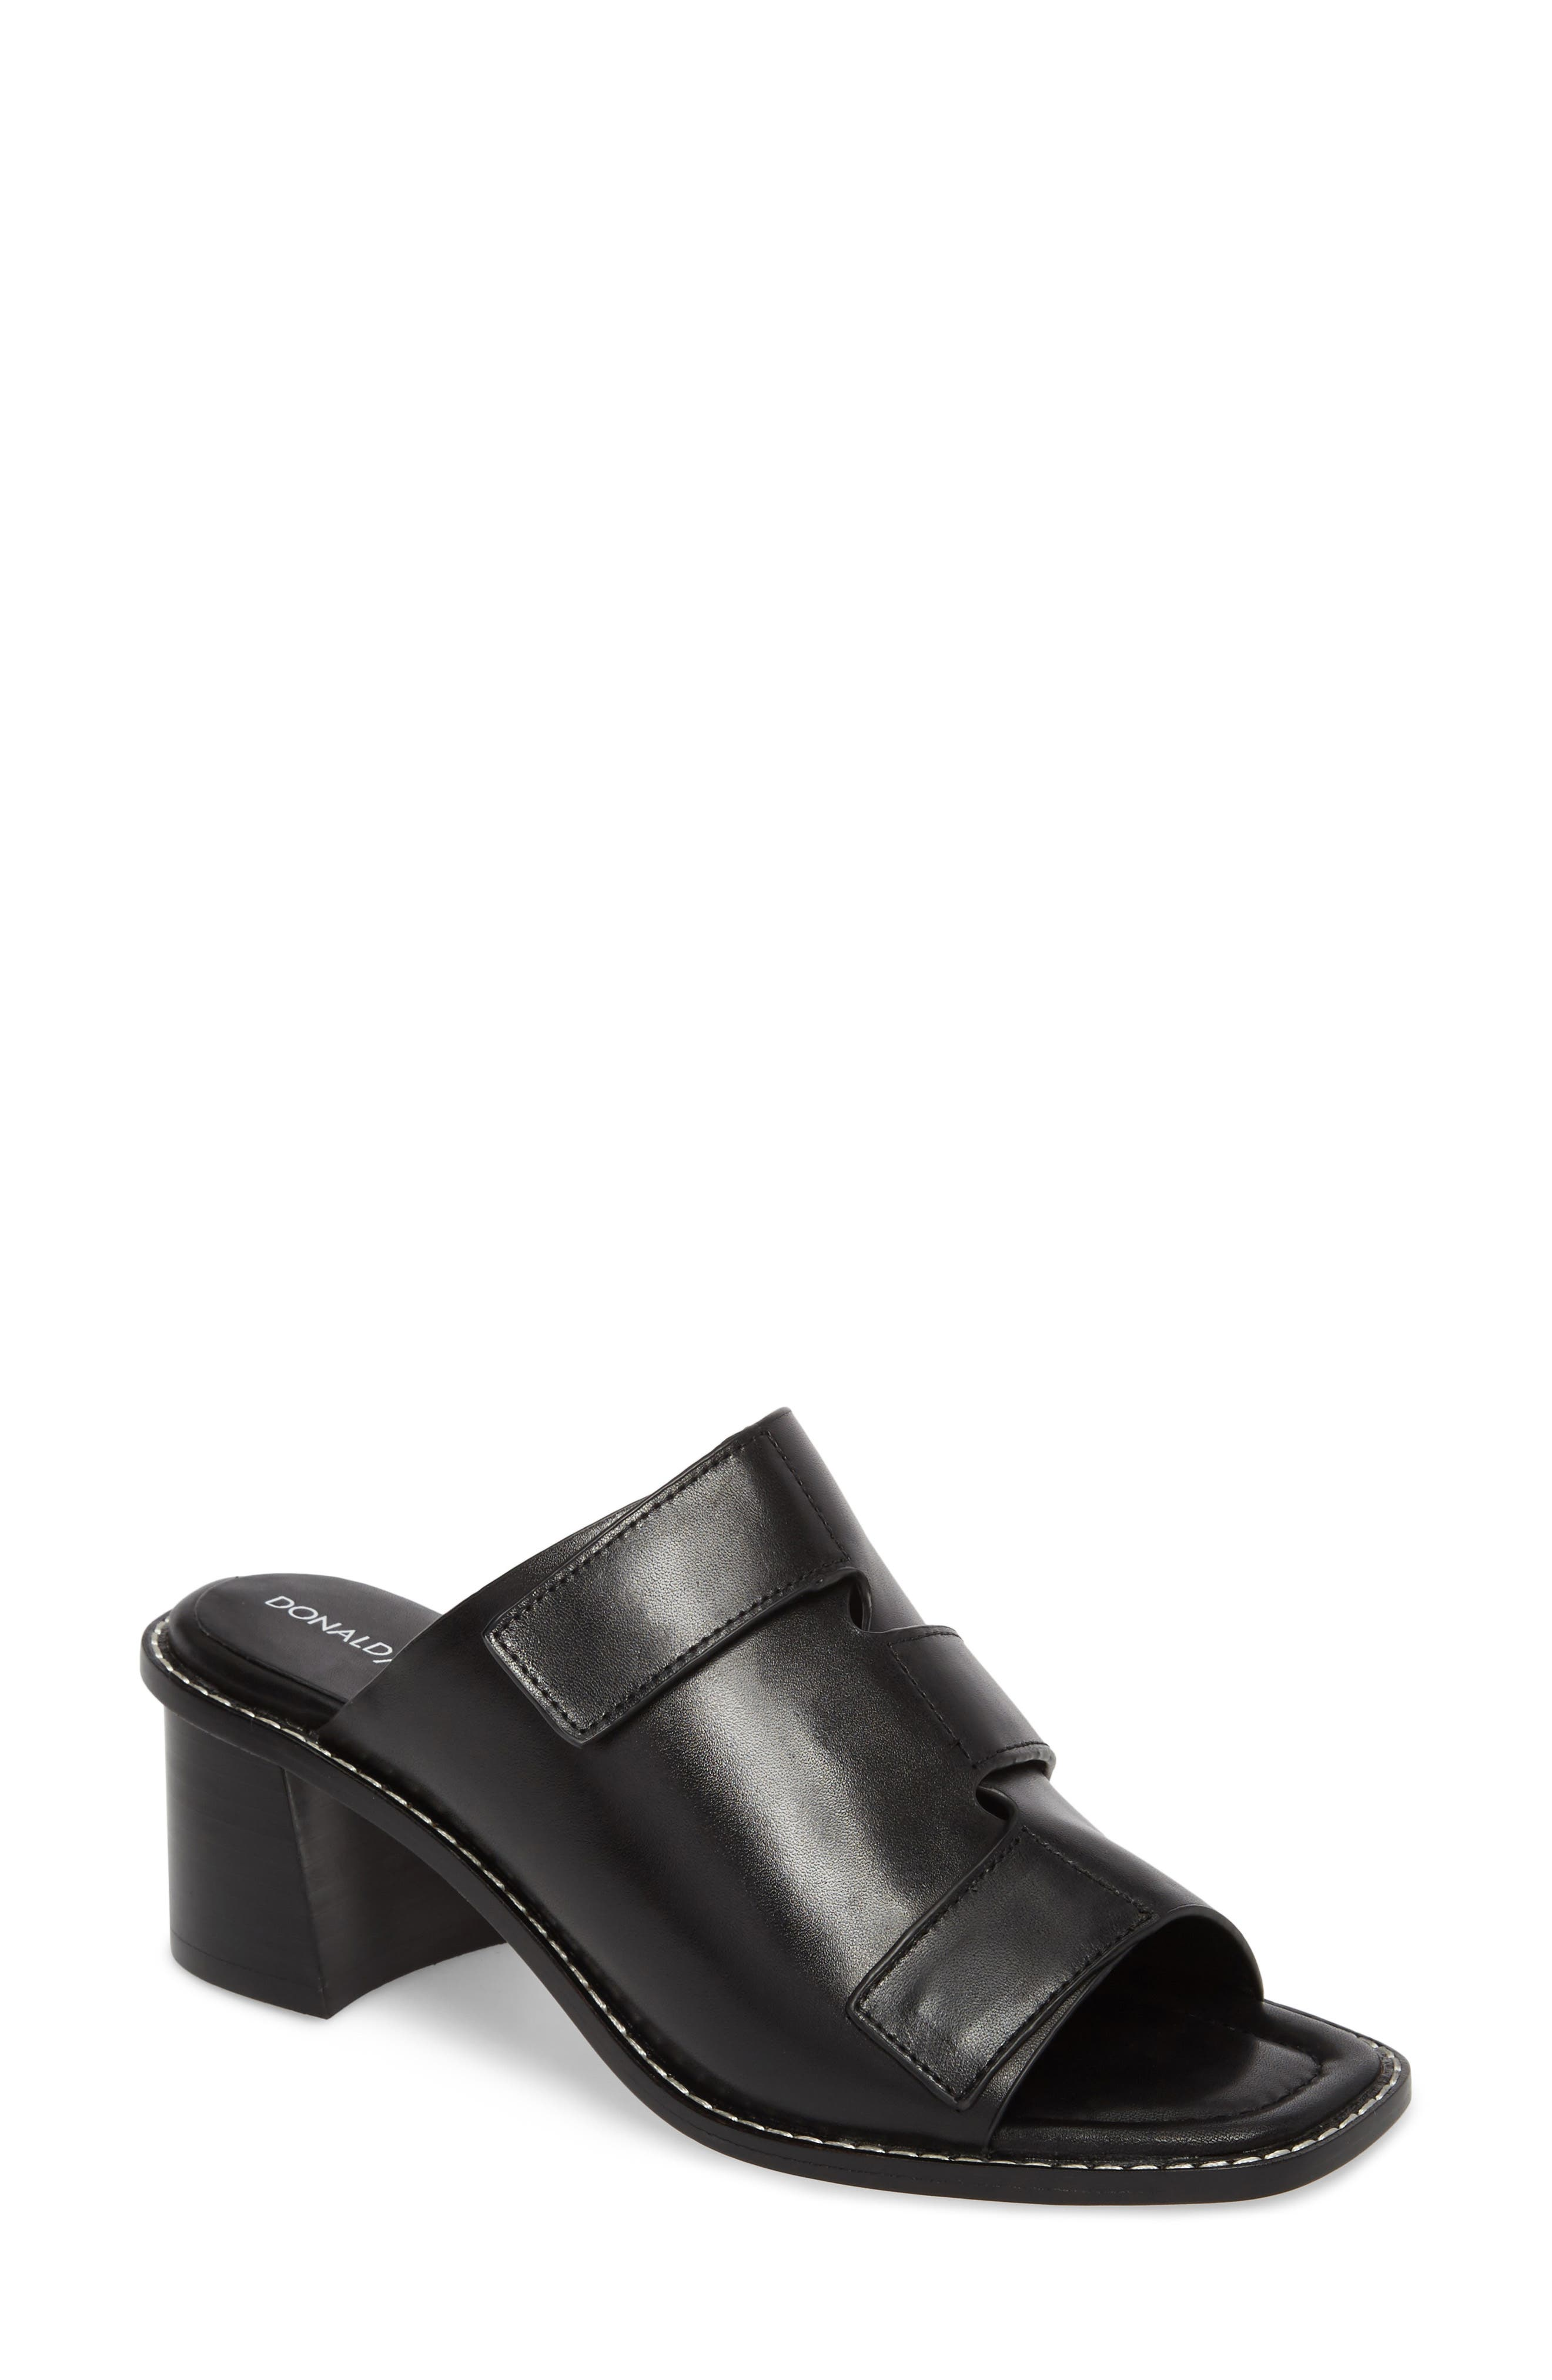 Amalia Block Heel Sandal,                         Main,                         color, 001